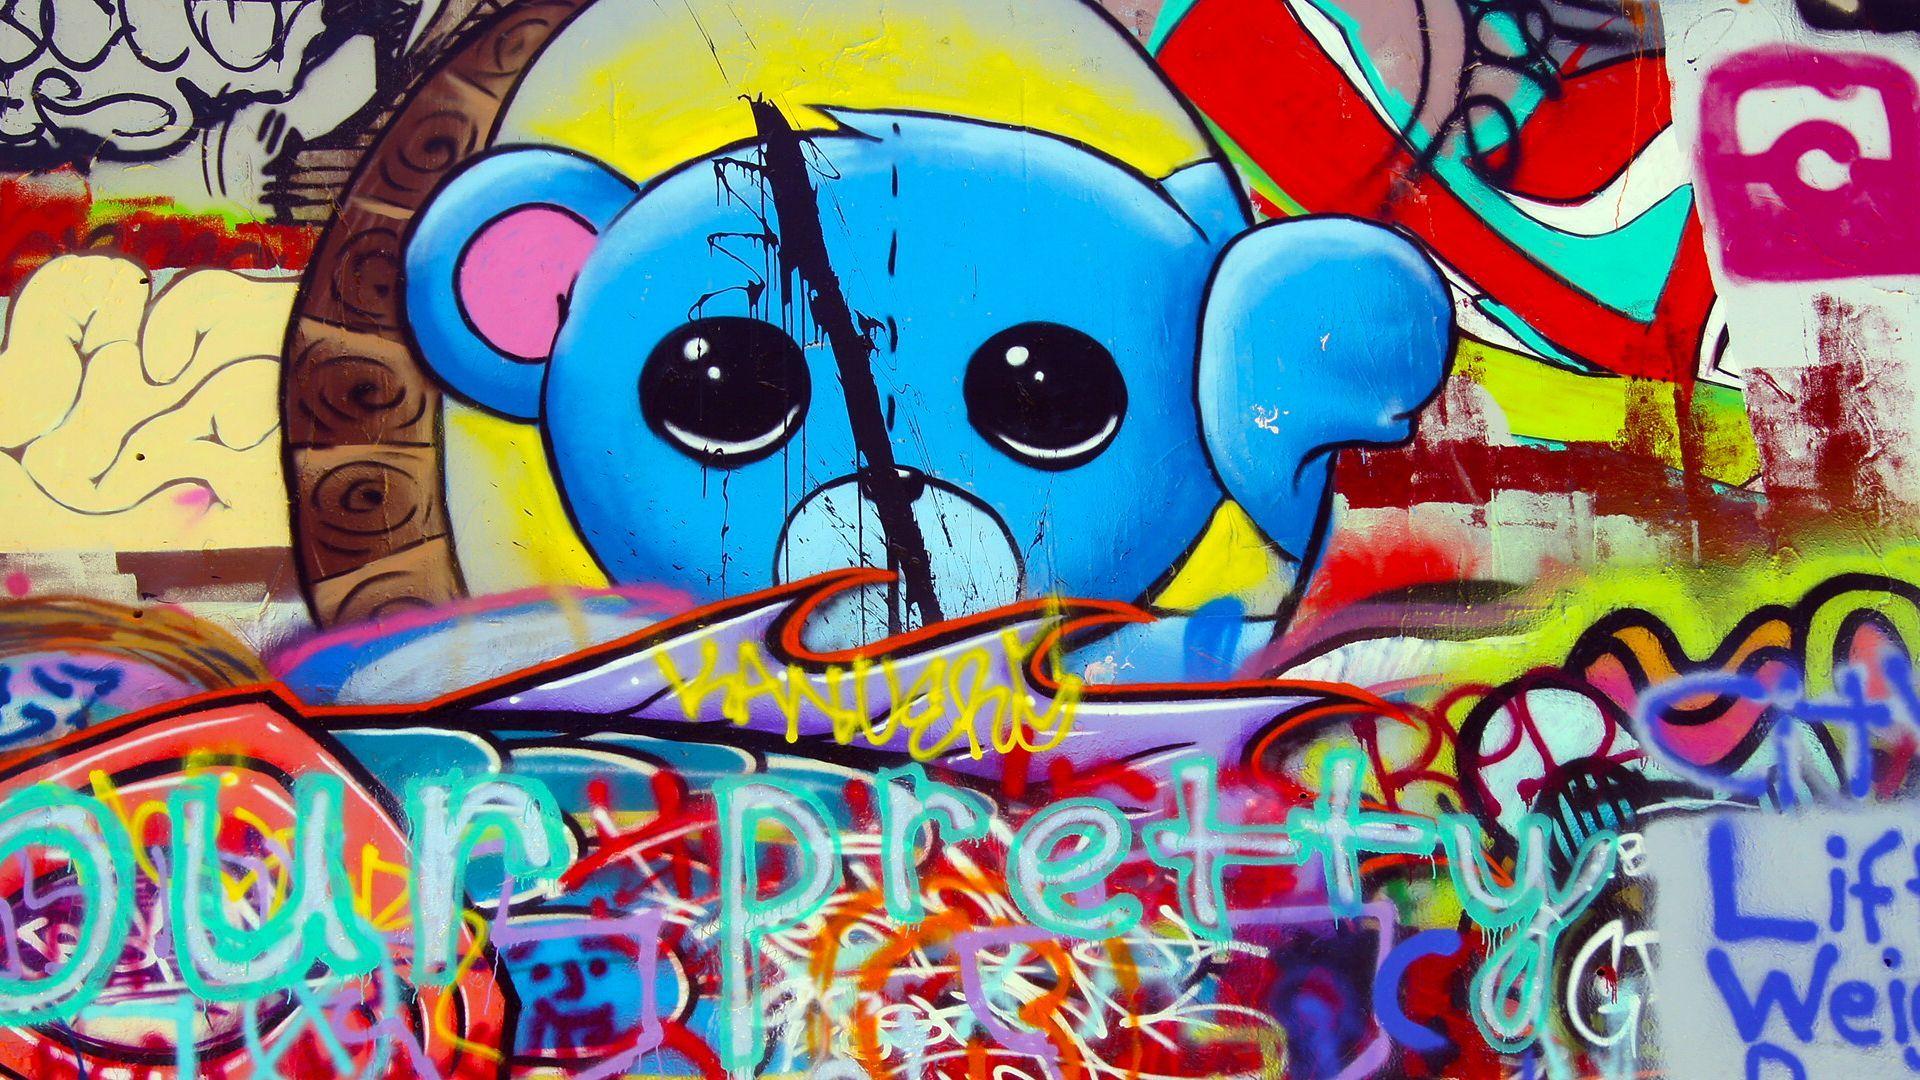 Street Art wallpaper theme